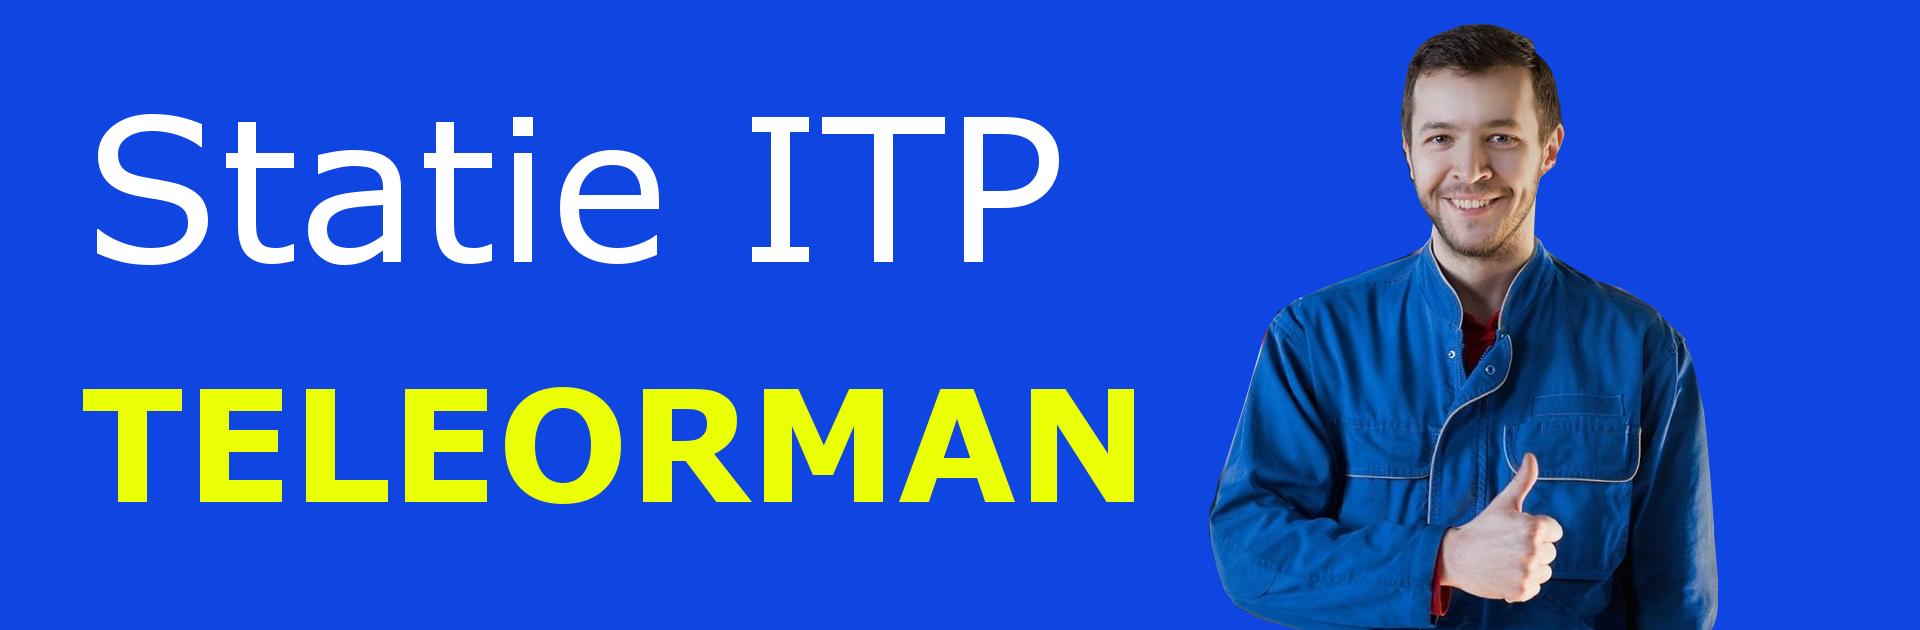 Banner ITP TELEORMAN